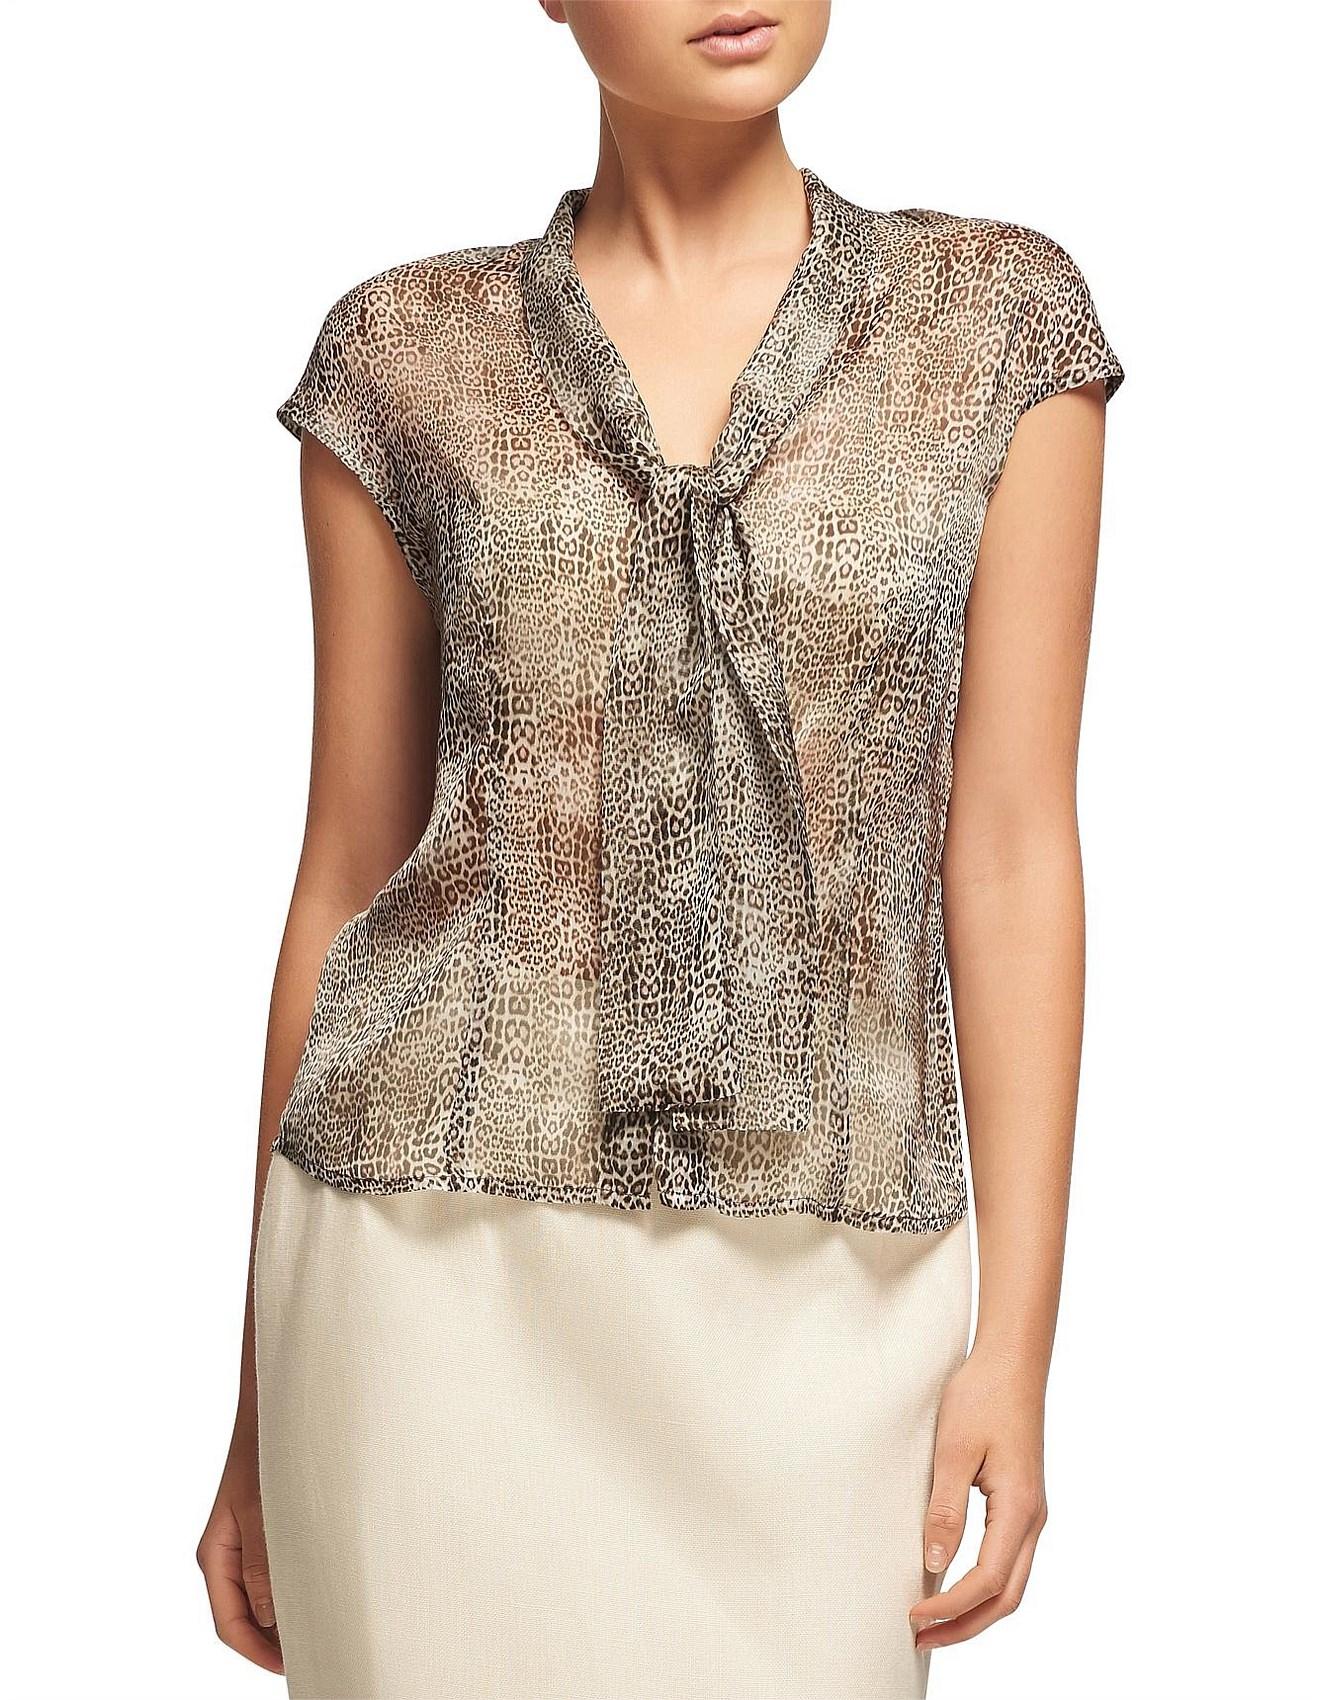 Perri Cutten 8 Women's Clothing Silk Dress In Excellent Condition